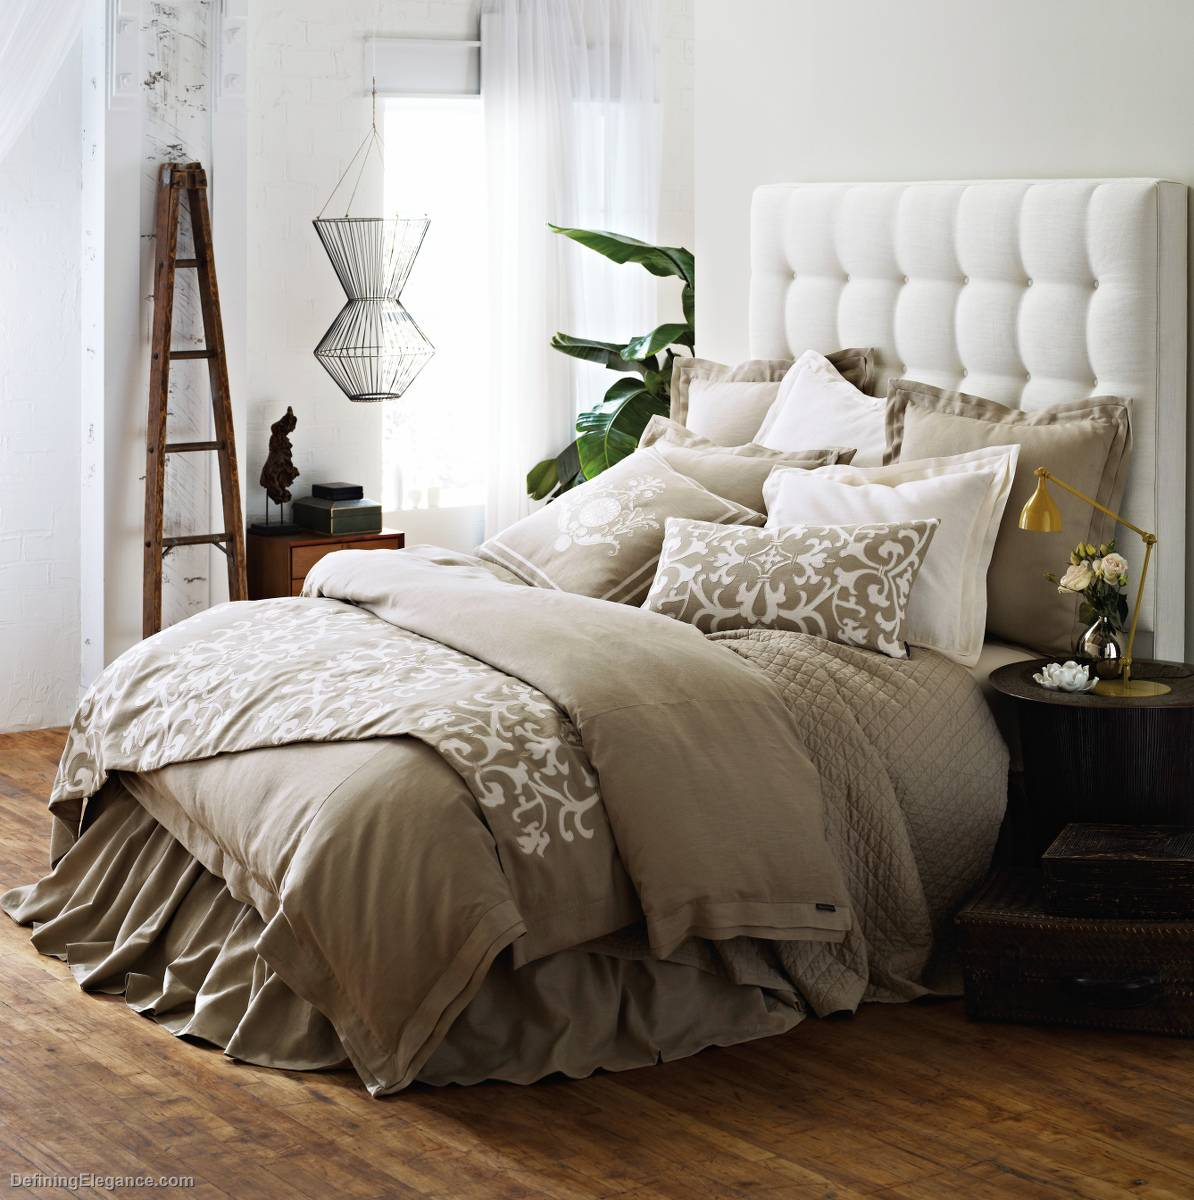 Discontinued Lili Alessandra Jon L Bedding Flax Linen With